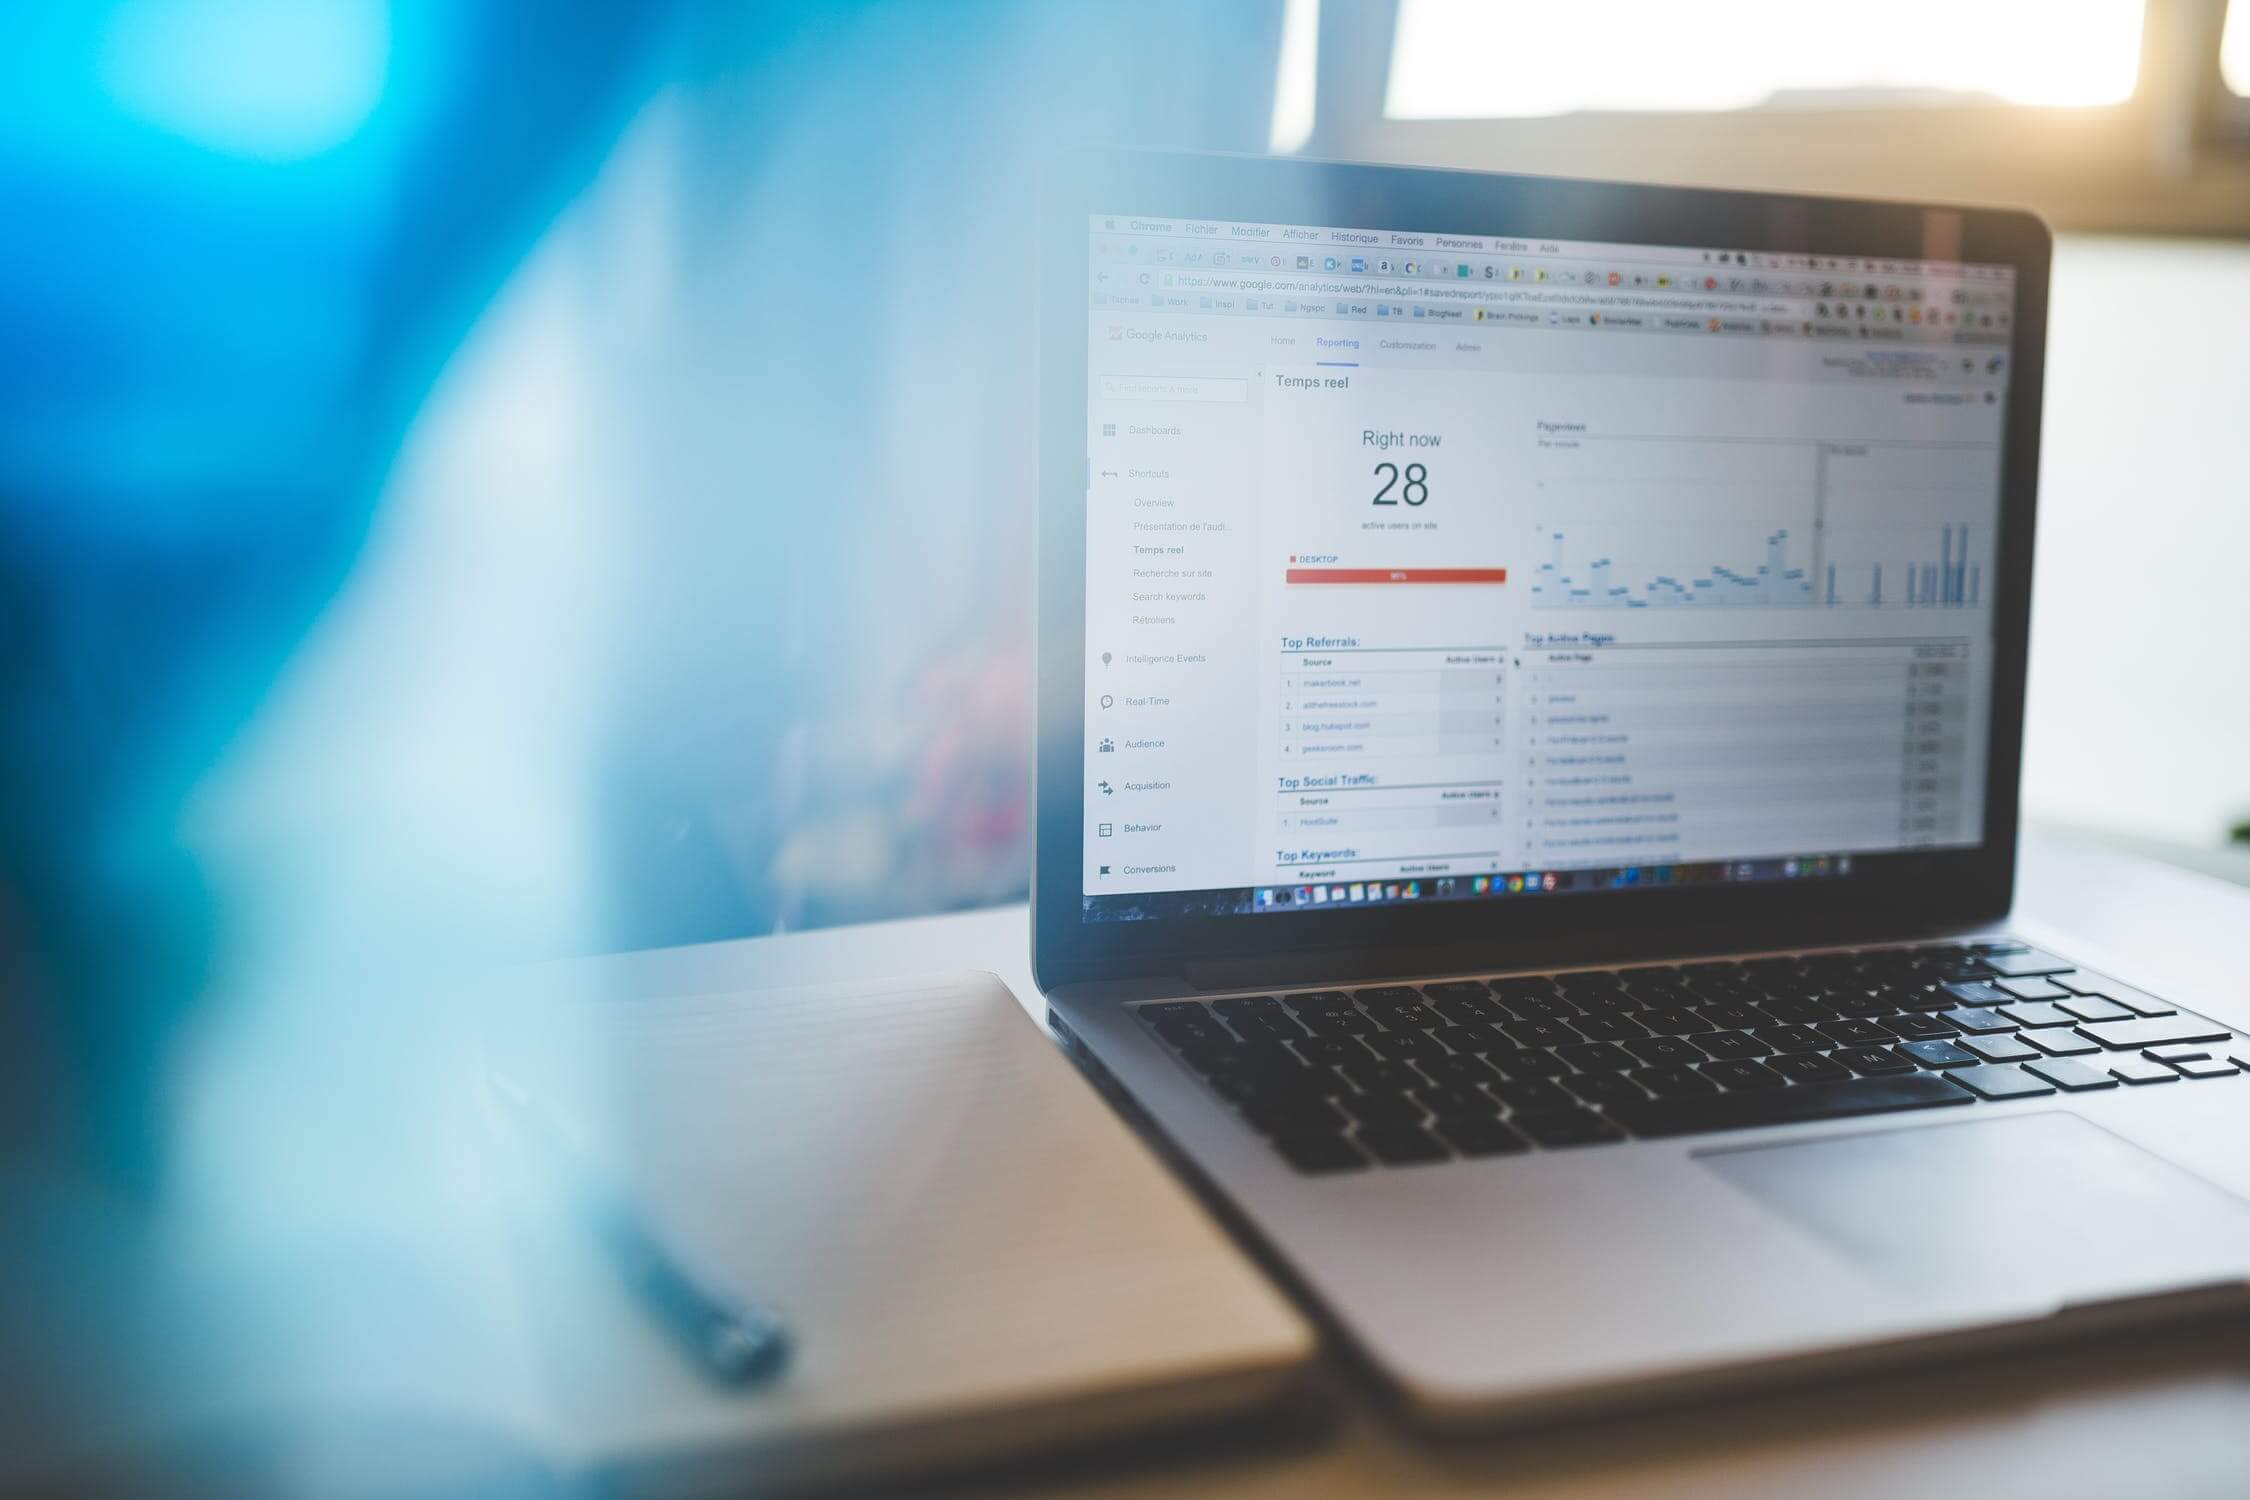 A laptop screen showing Google Analytics